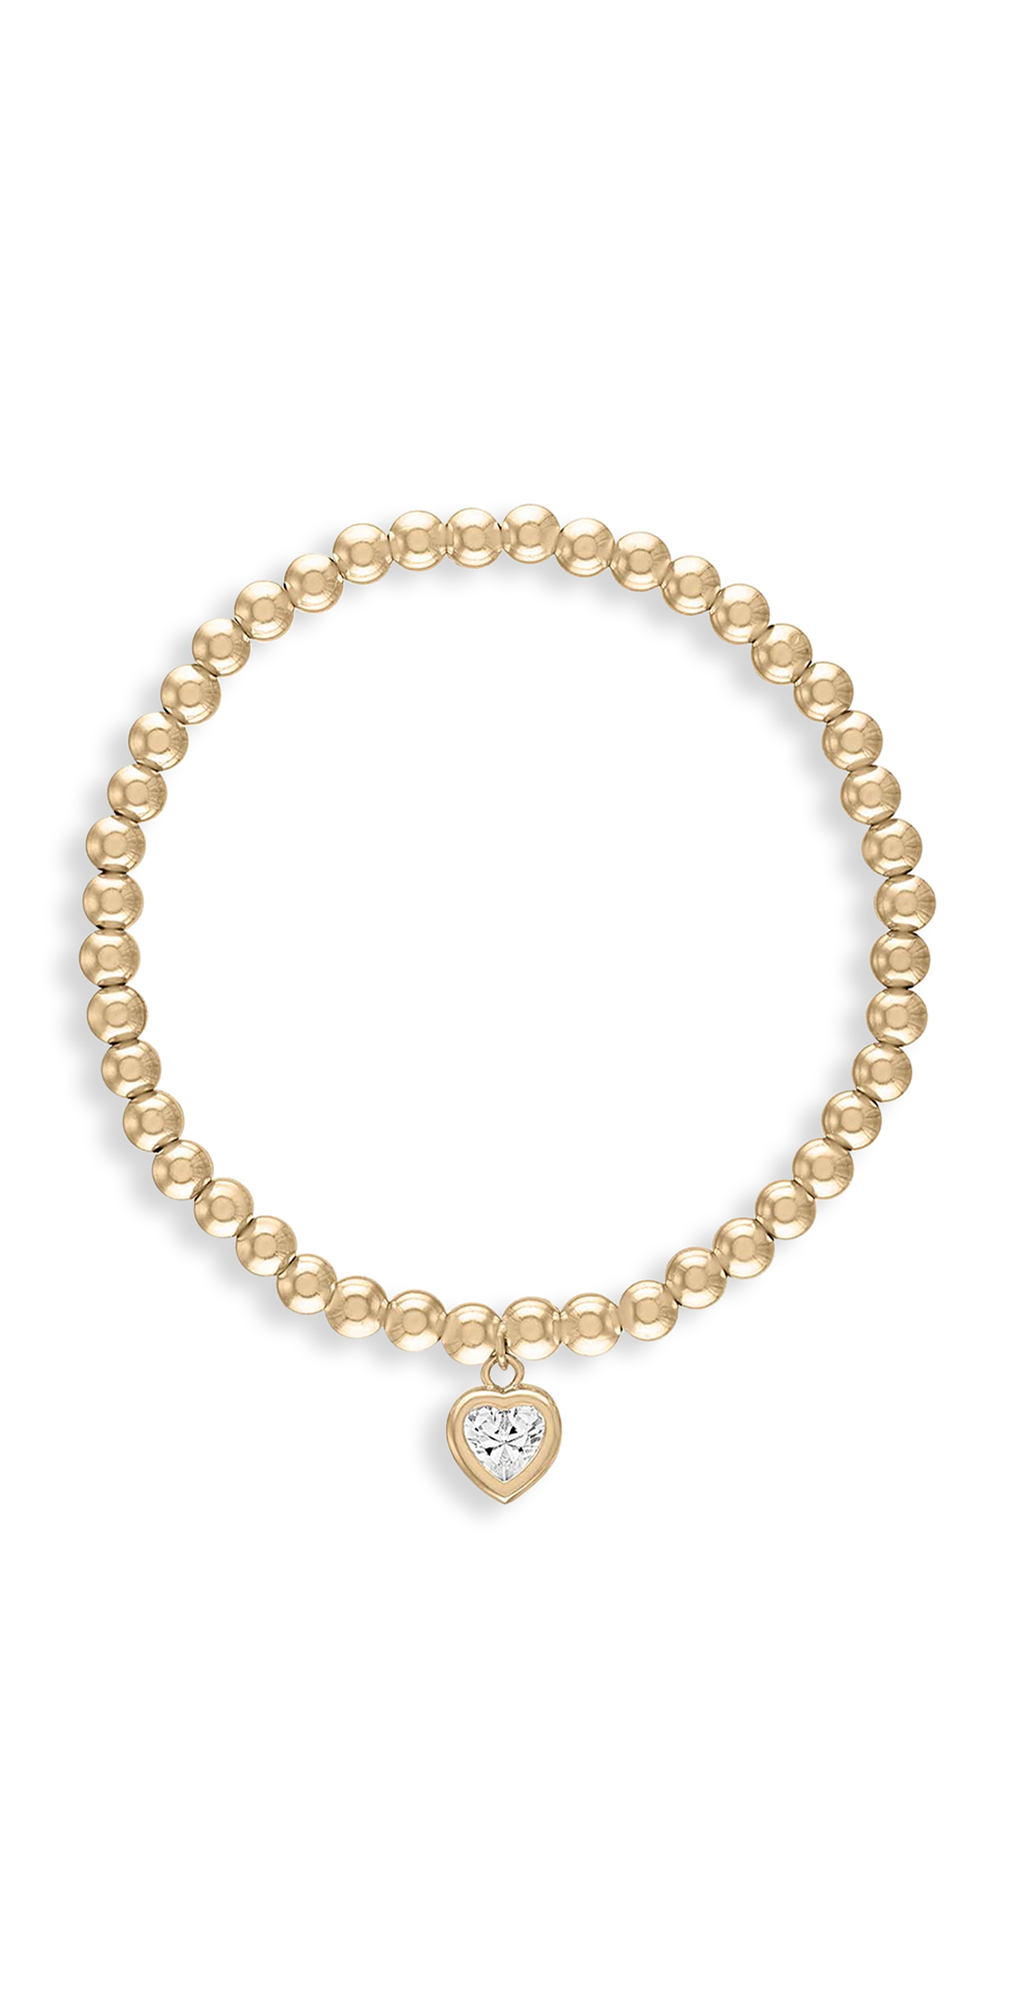 4mm All My Heart Gold Bracelet